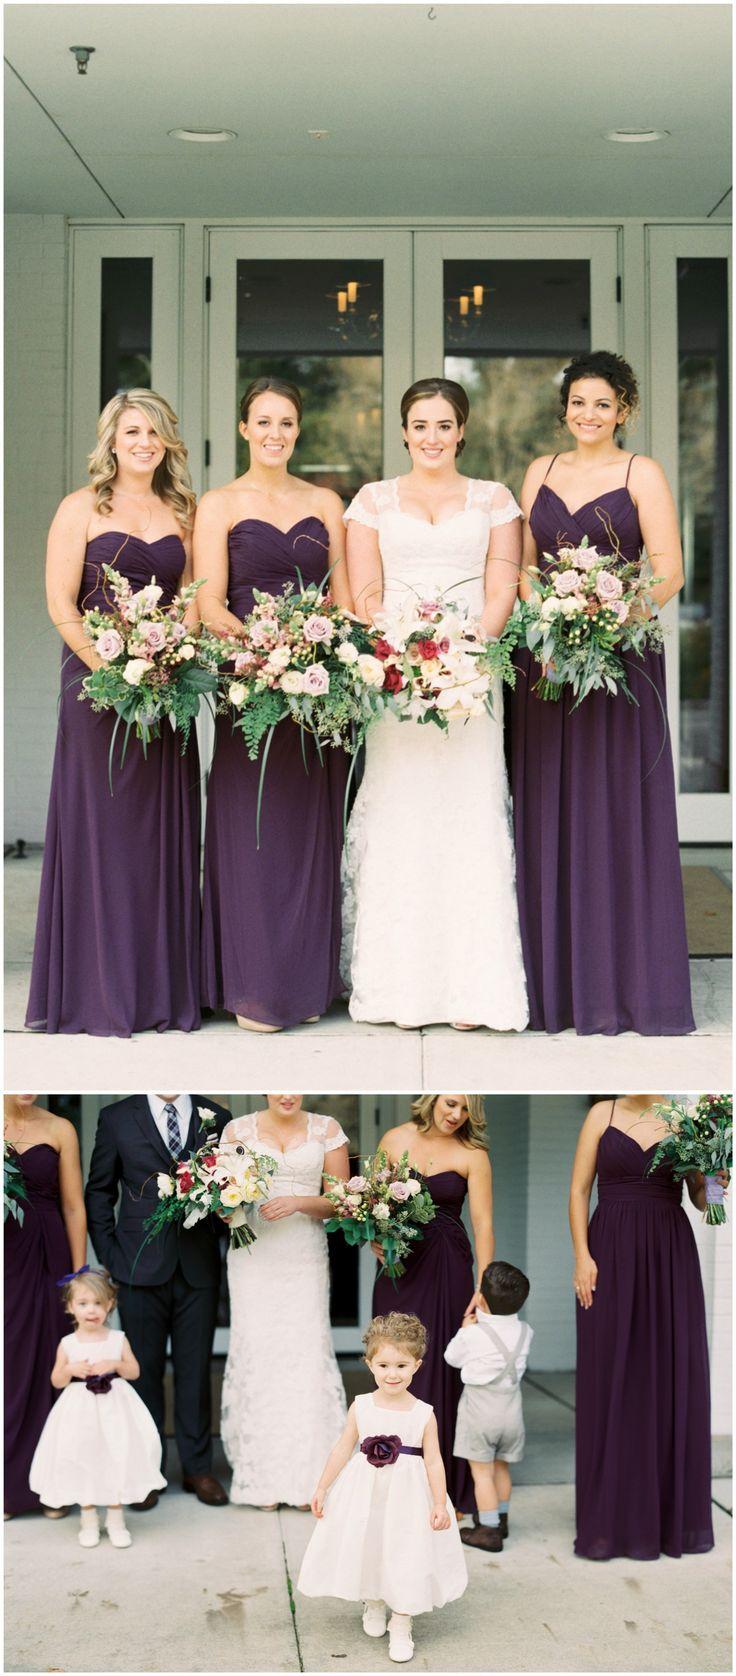 17 Best Ideas About Eggplant Bridesmaid Dresses On Pinterest Eggplant Weddi